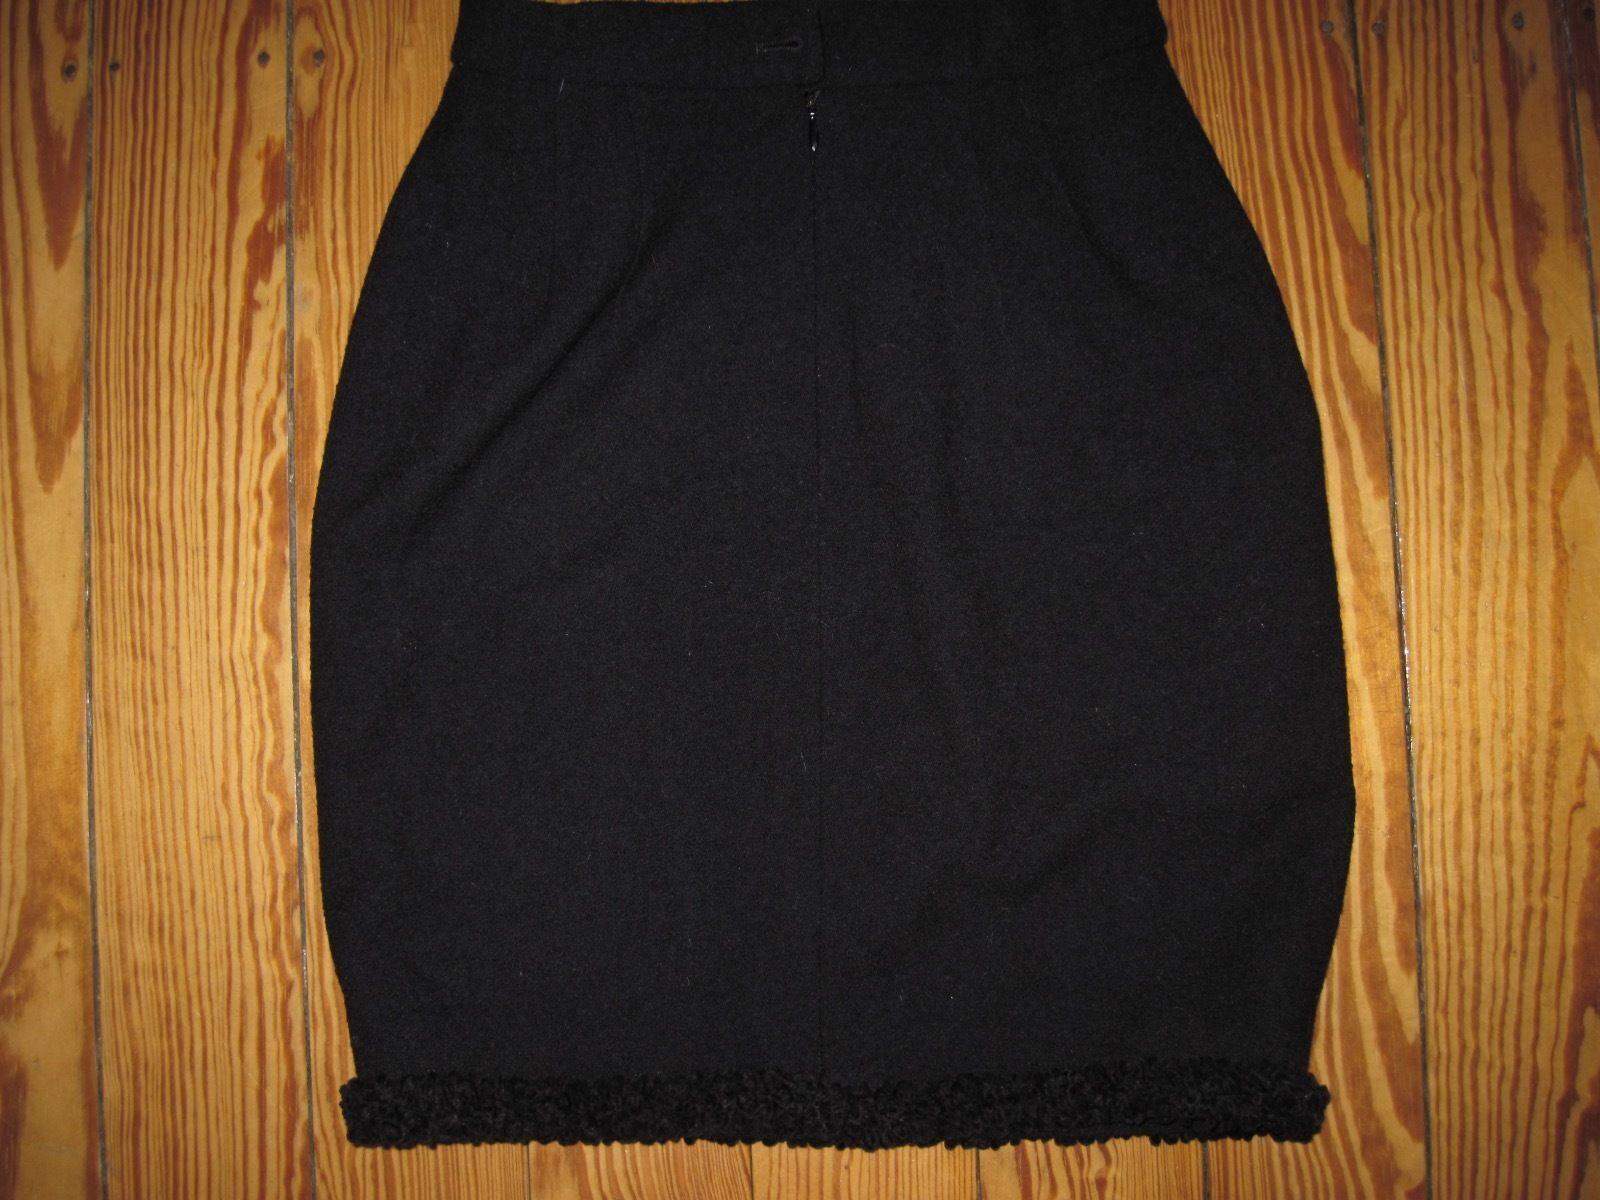 LUSSO Escada BOUCLE Couture Knit A A A MAGLIA GONNA SKIRT PIZZO NERO 34 36 np980, - eebf91